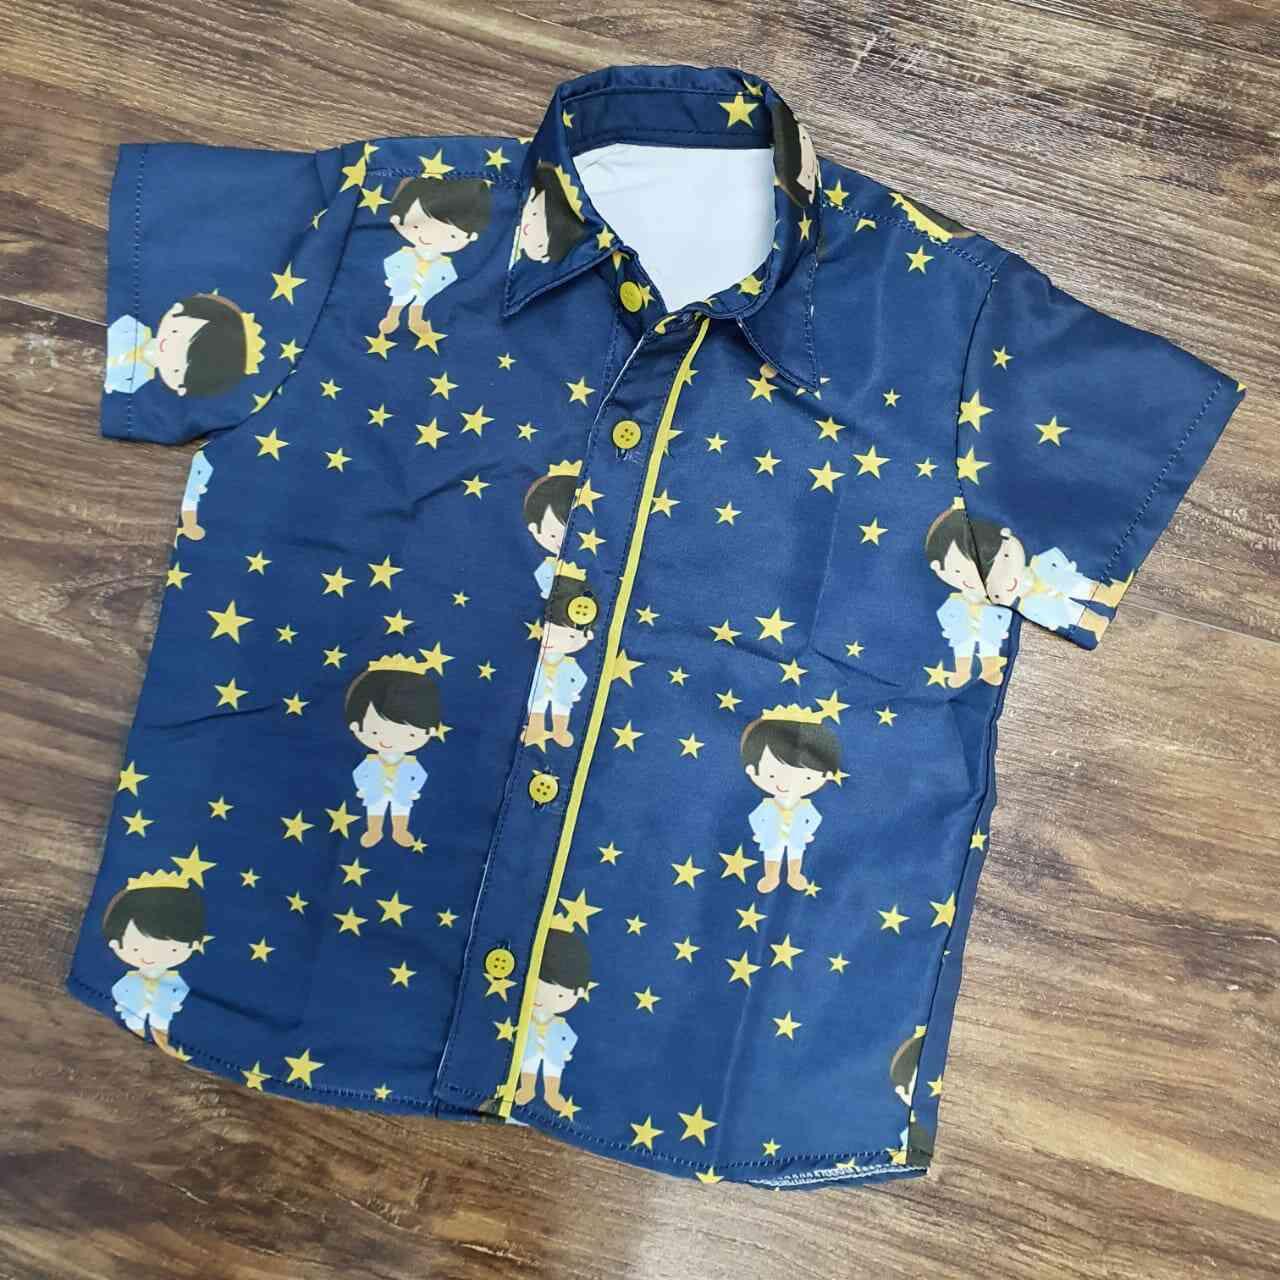 Camisa Pequeno Príncipe